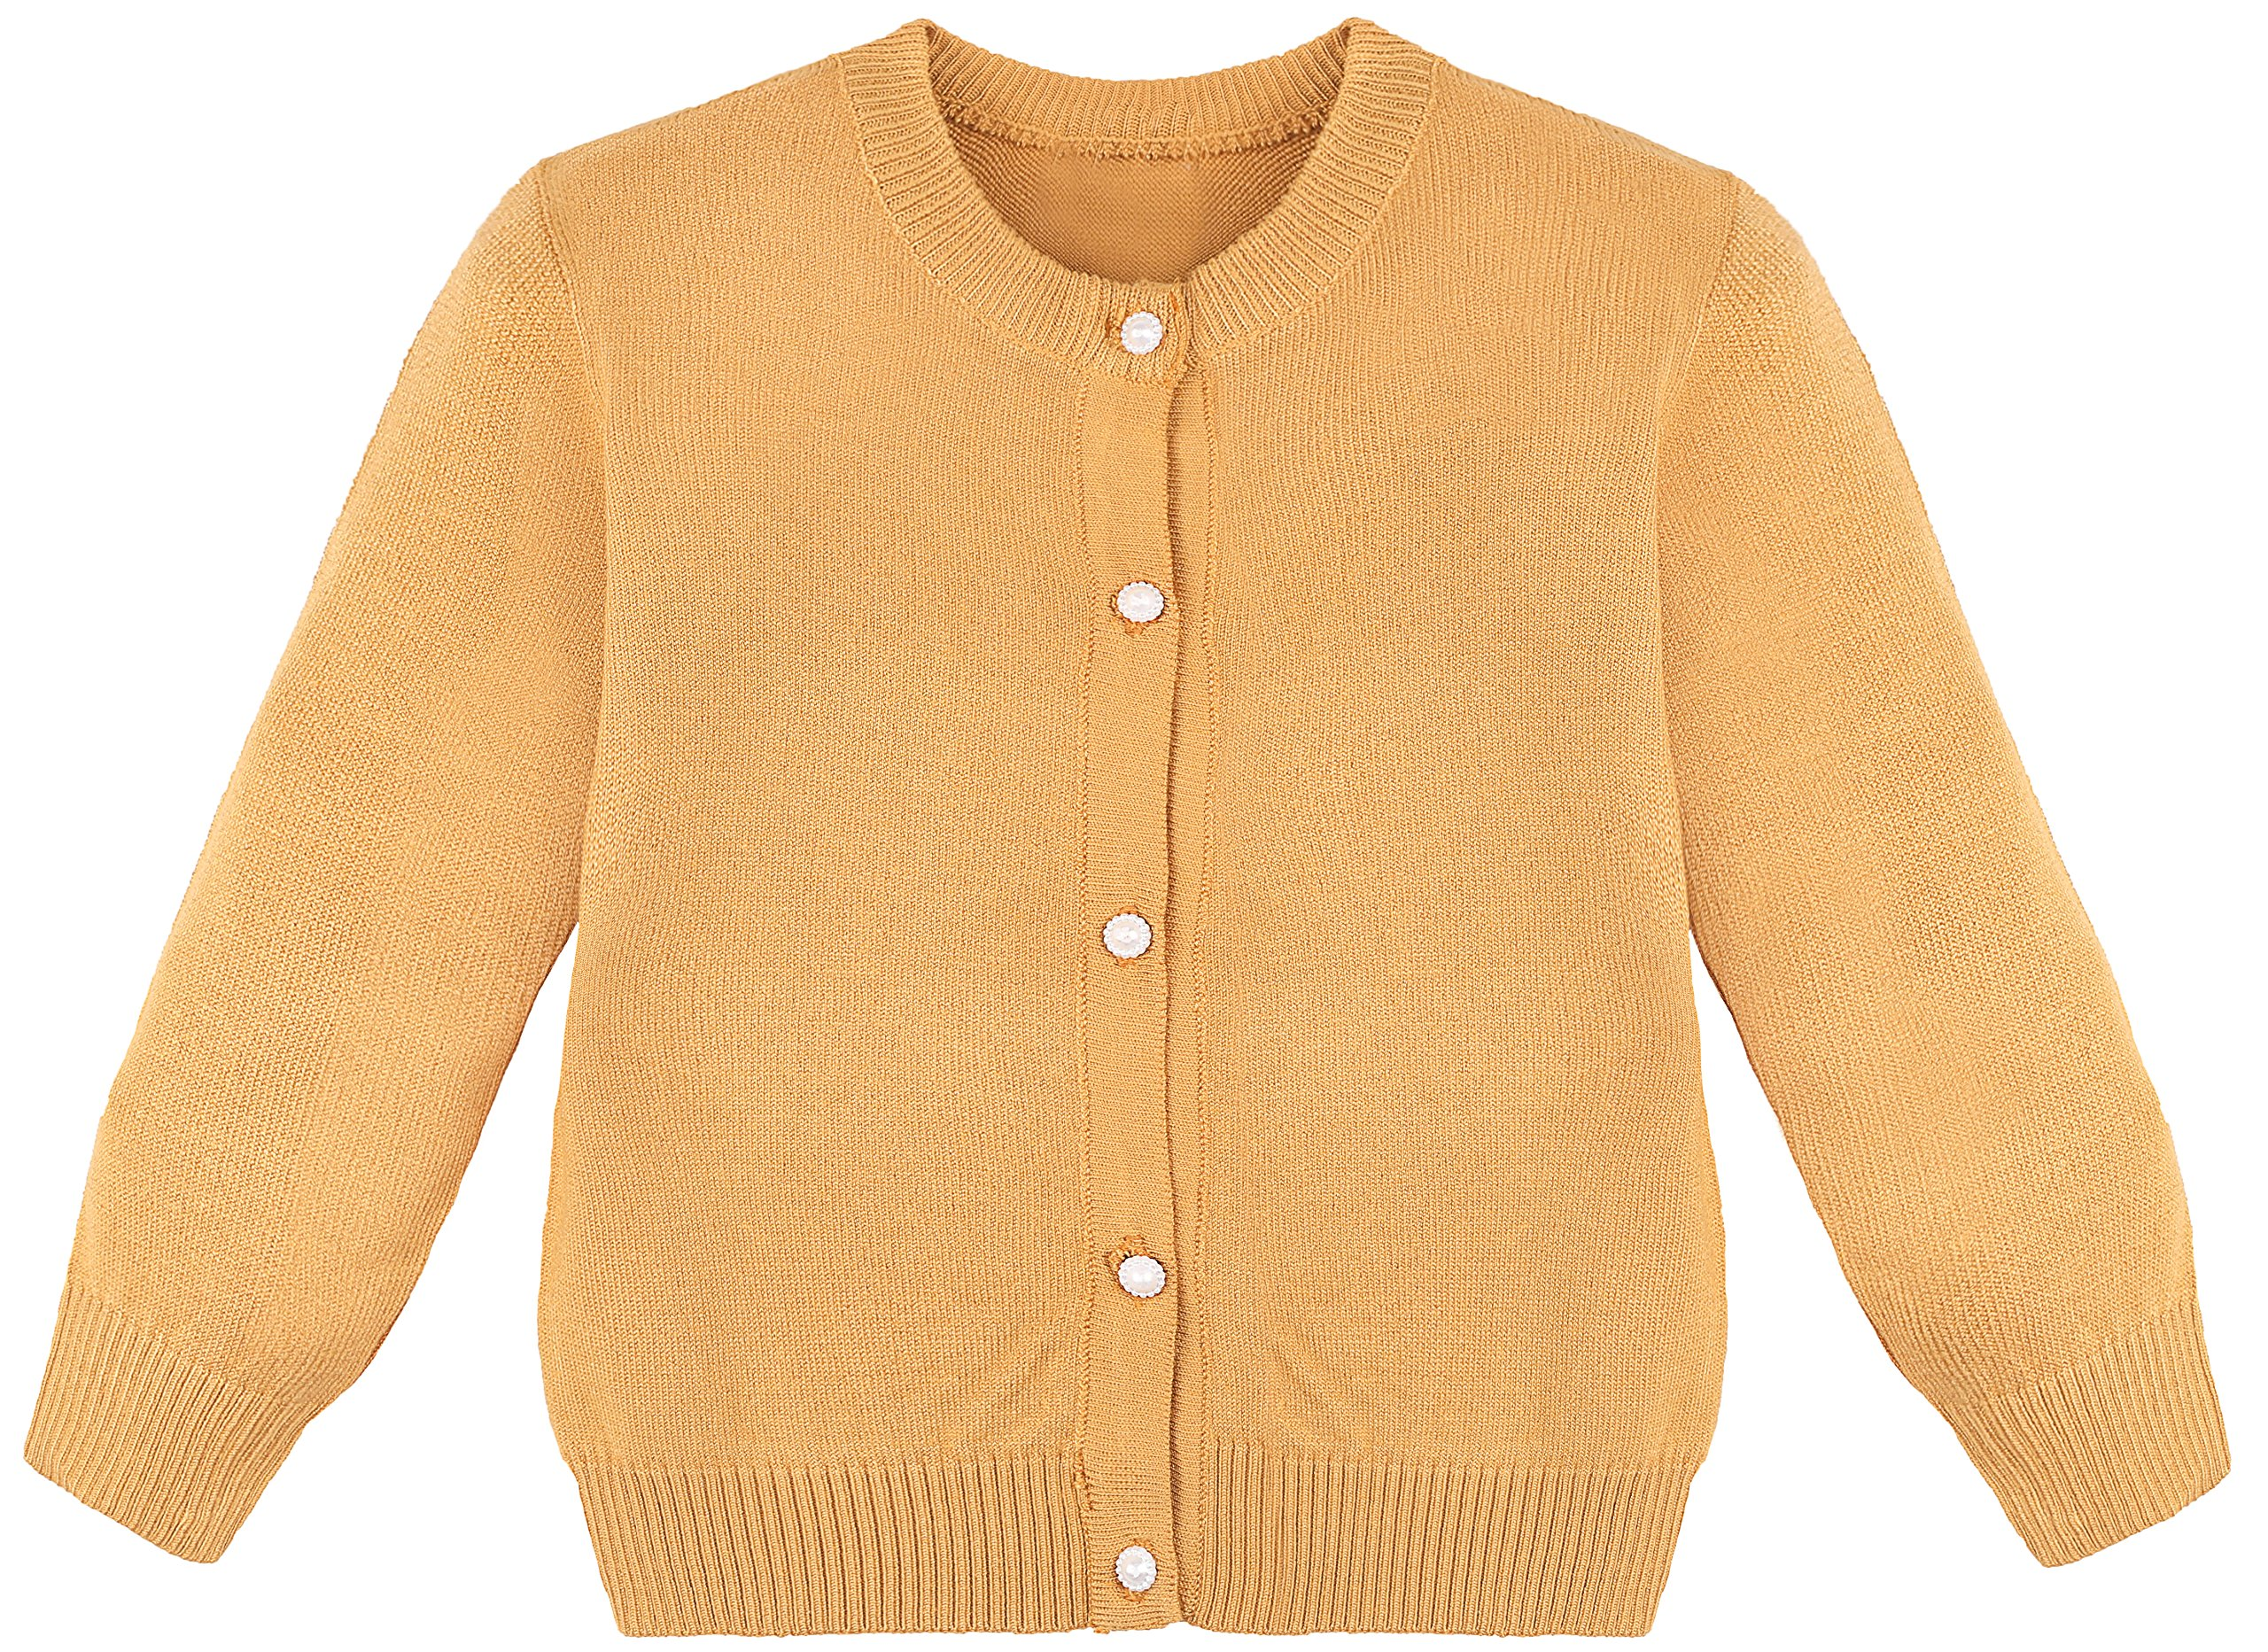 Lilax Little Girls' Knit Uniform Cardigan Long Sleeve Sweater 7 Mustard